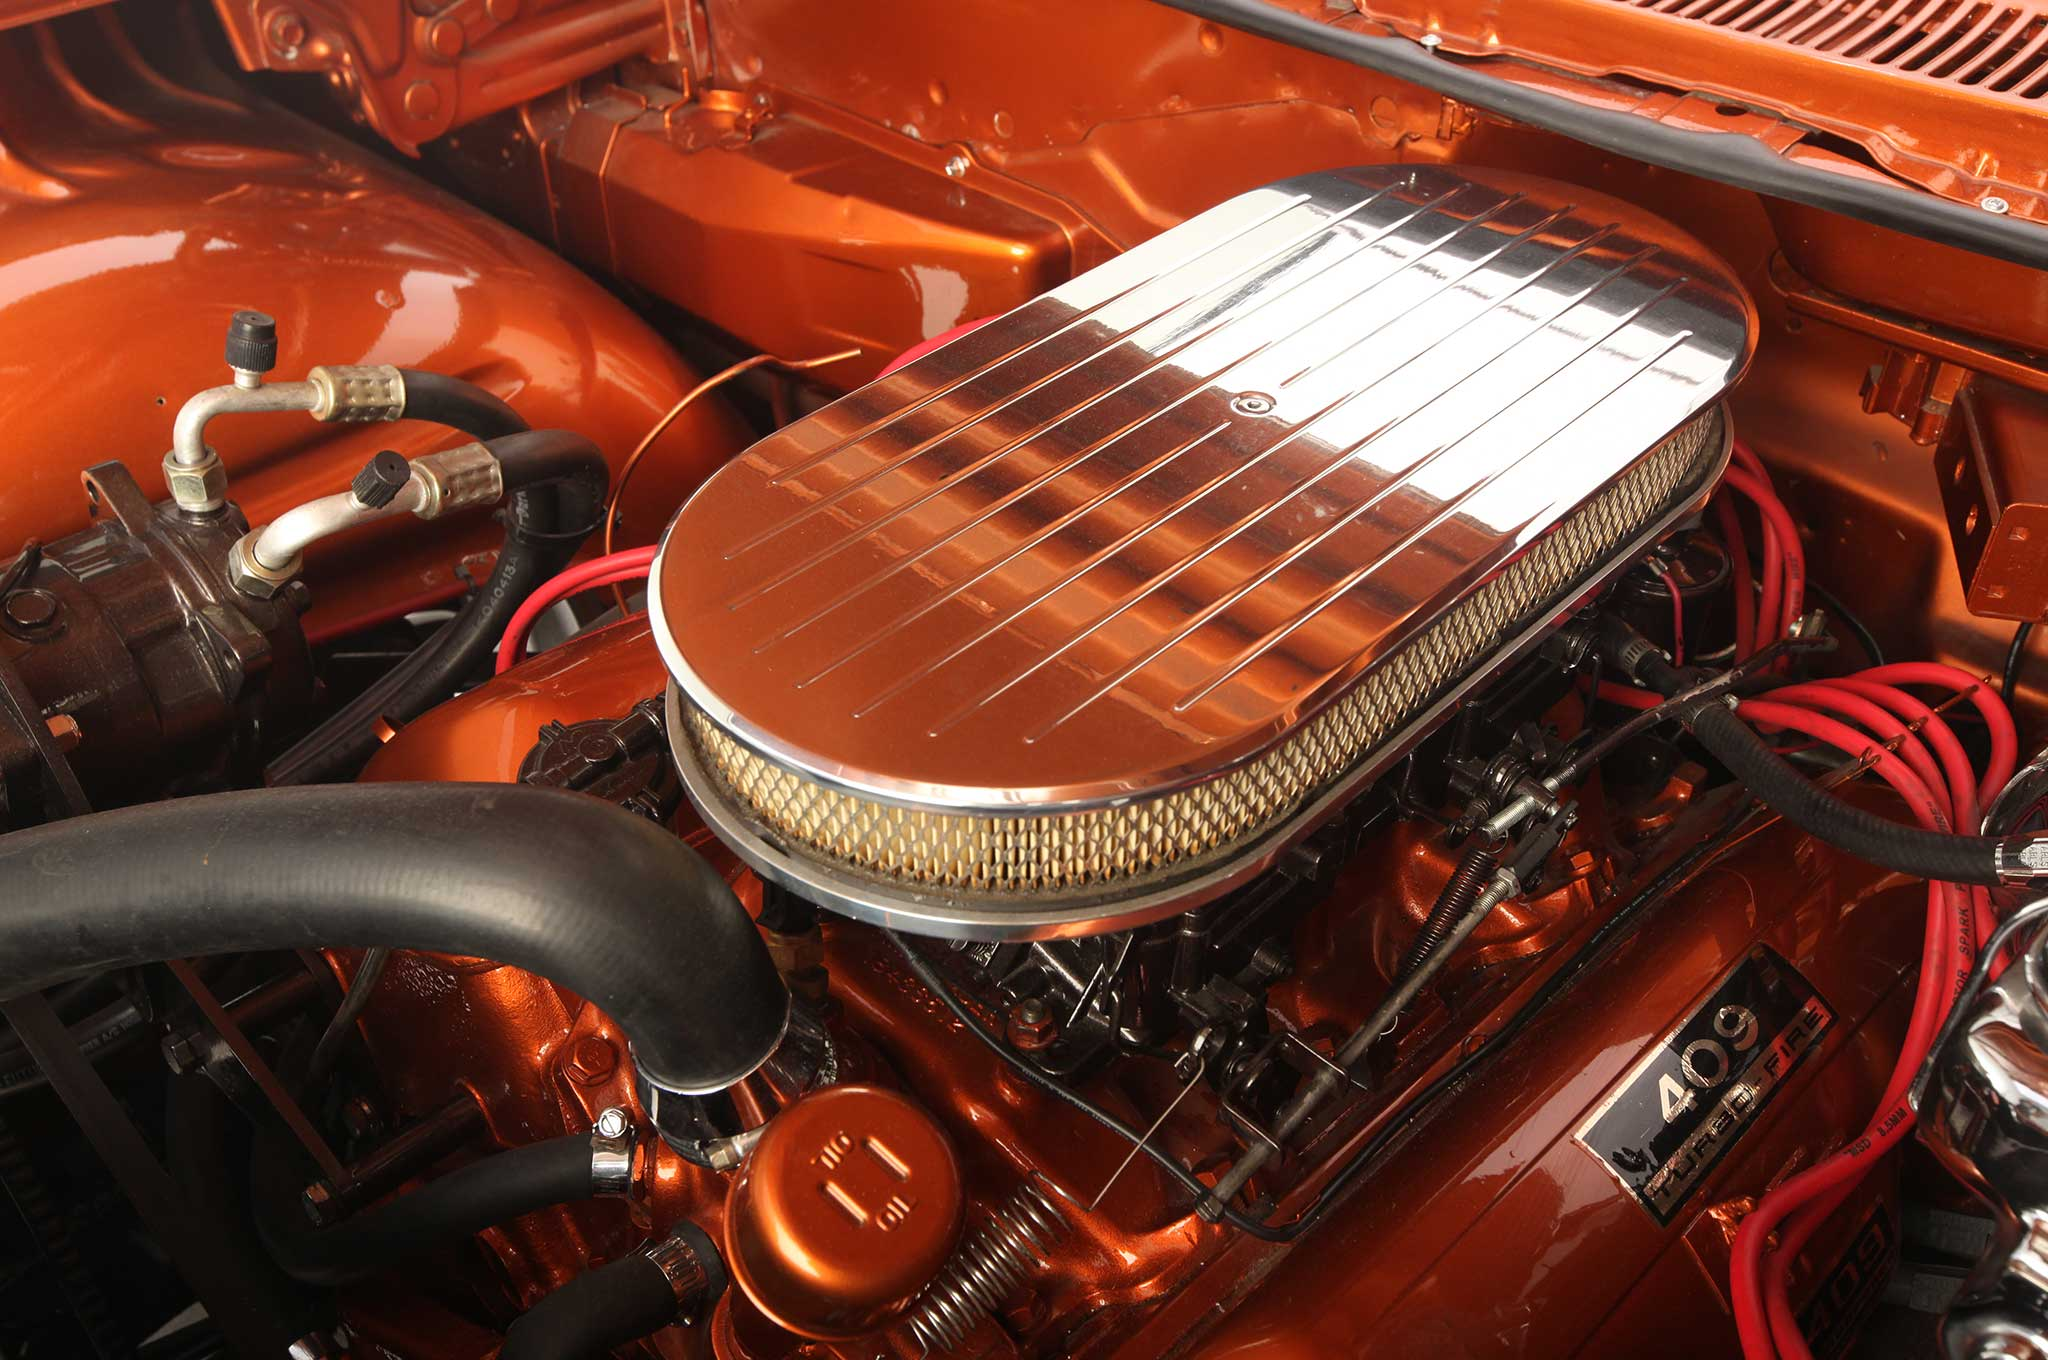 1959 chevrolet bel air air cleaner 018